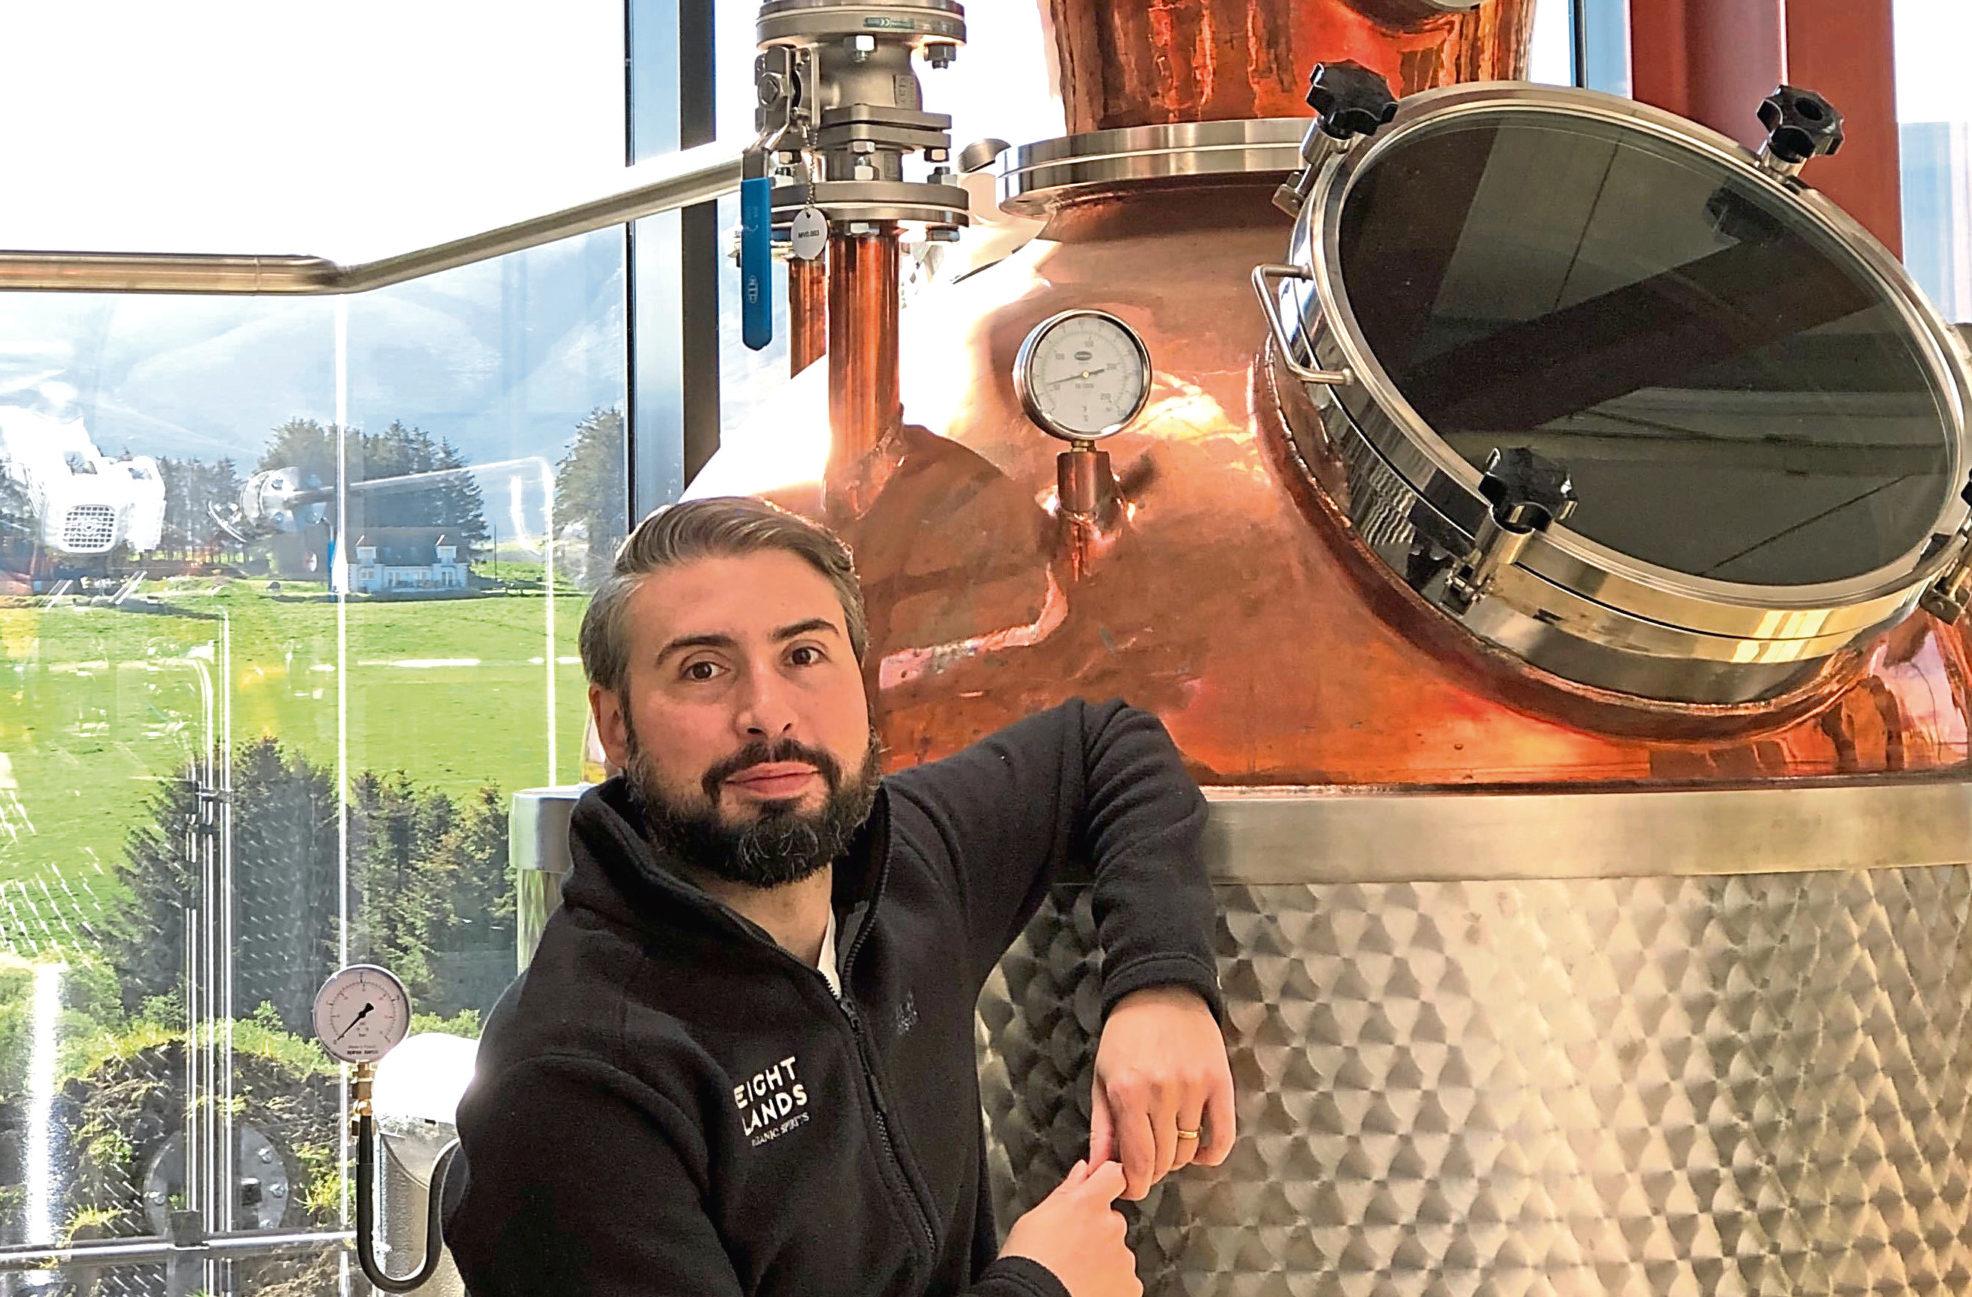 Alex Christou at Glenrinnes Distillery